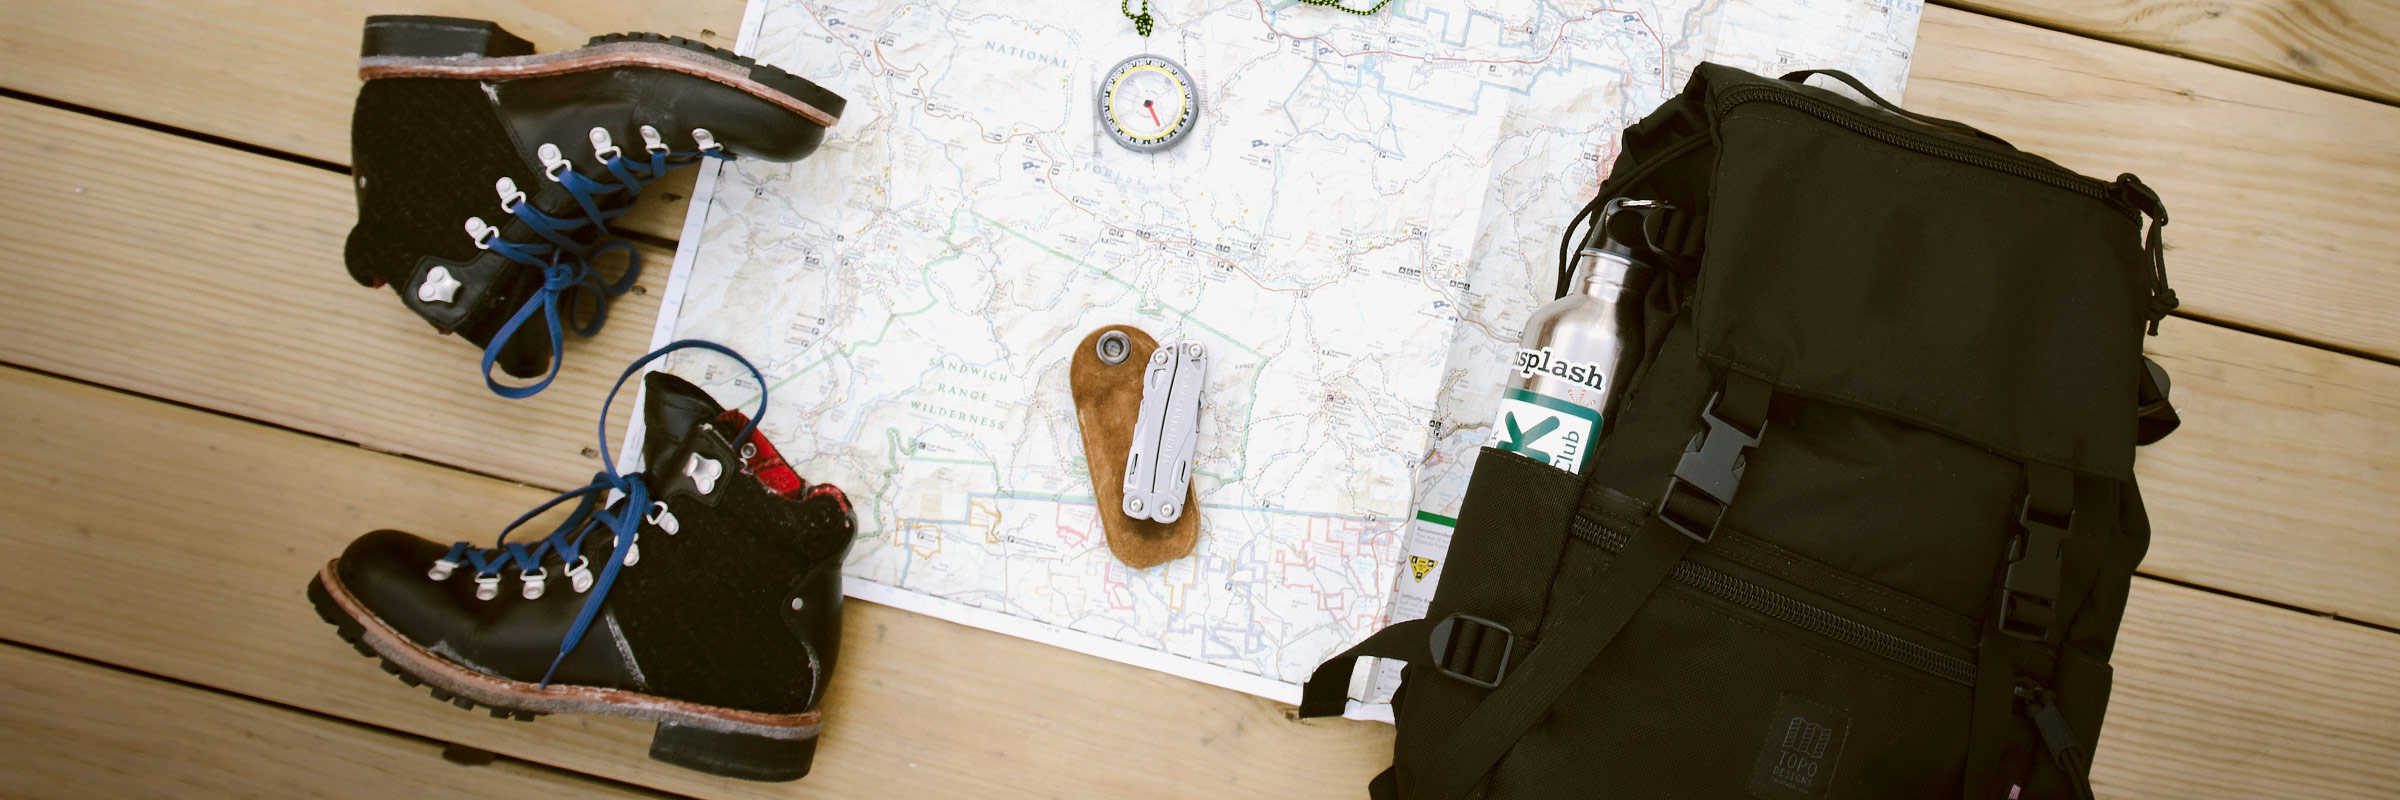 Adventure Medical Kits, Arc'teryx, Clif Bar, Coleman, Counter Assault, Goal Zero, Hiking & Trekking, Hydrapak, Jetboil, Leatherman, Light My Fire, Nalgene, Opinel, Platypus, Red Pine, UCO, Victorinox, VSSL. 24 Helpful Hiking Hints & Hacks To Try On Your Next Hike